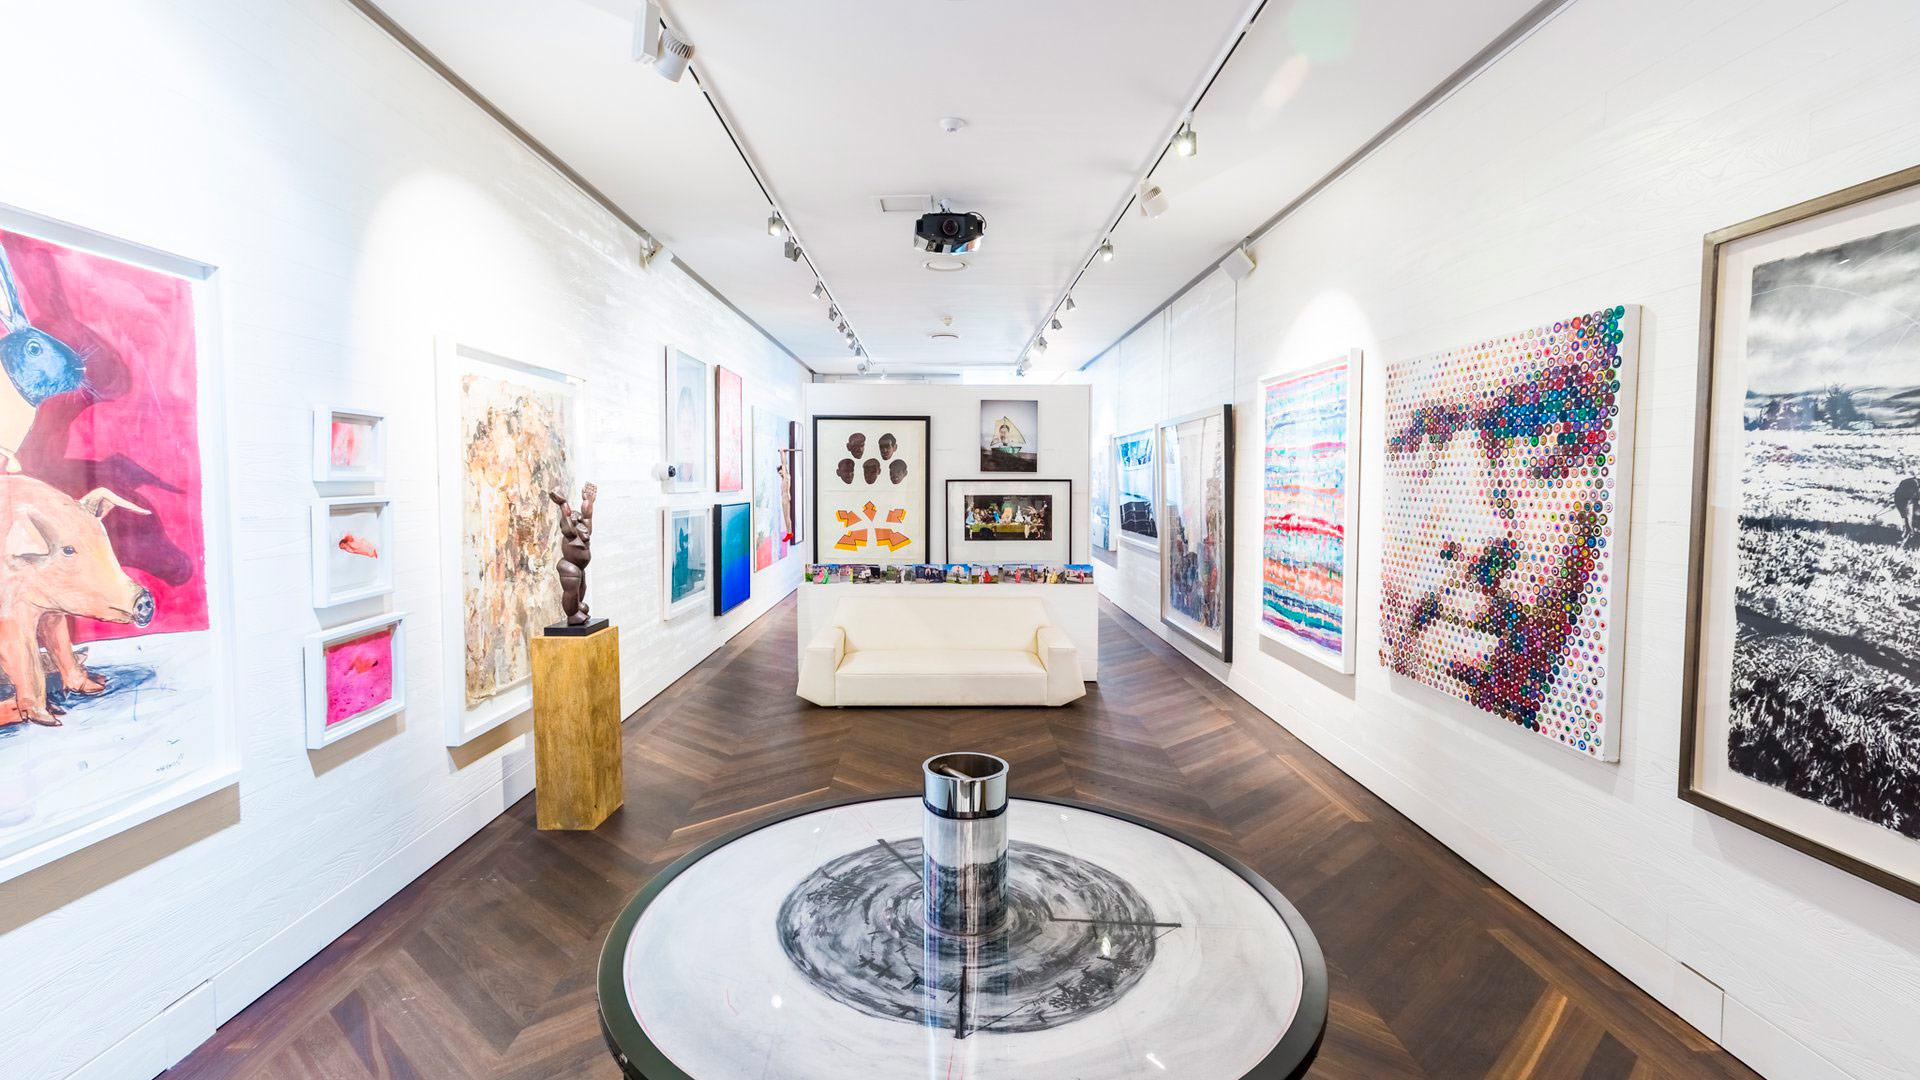 Ellerman House. Galeria de arte interior